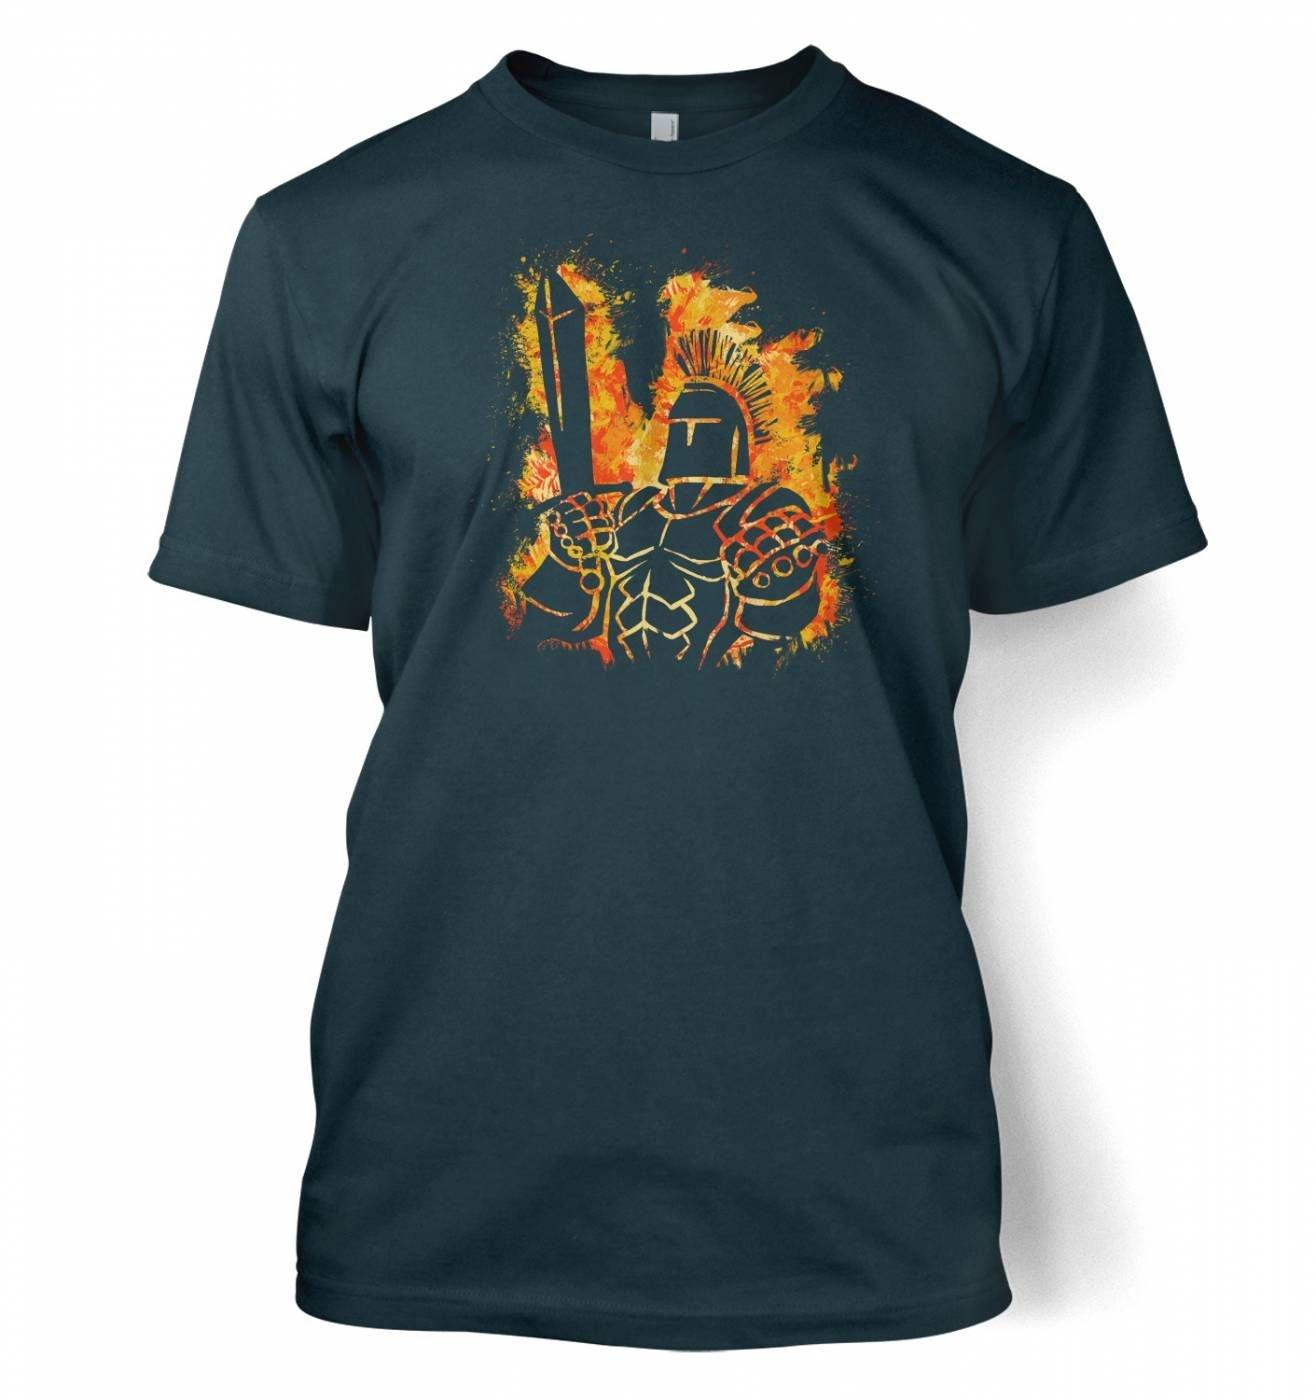 Fantasy RPG Fiery Knight t-shirt